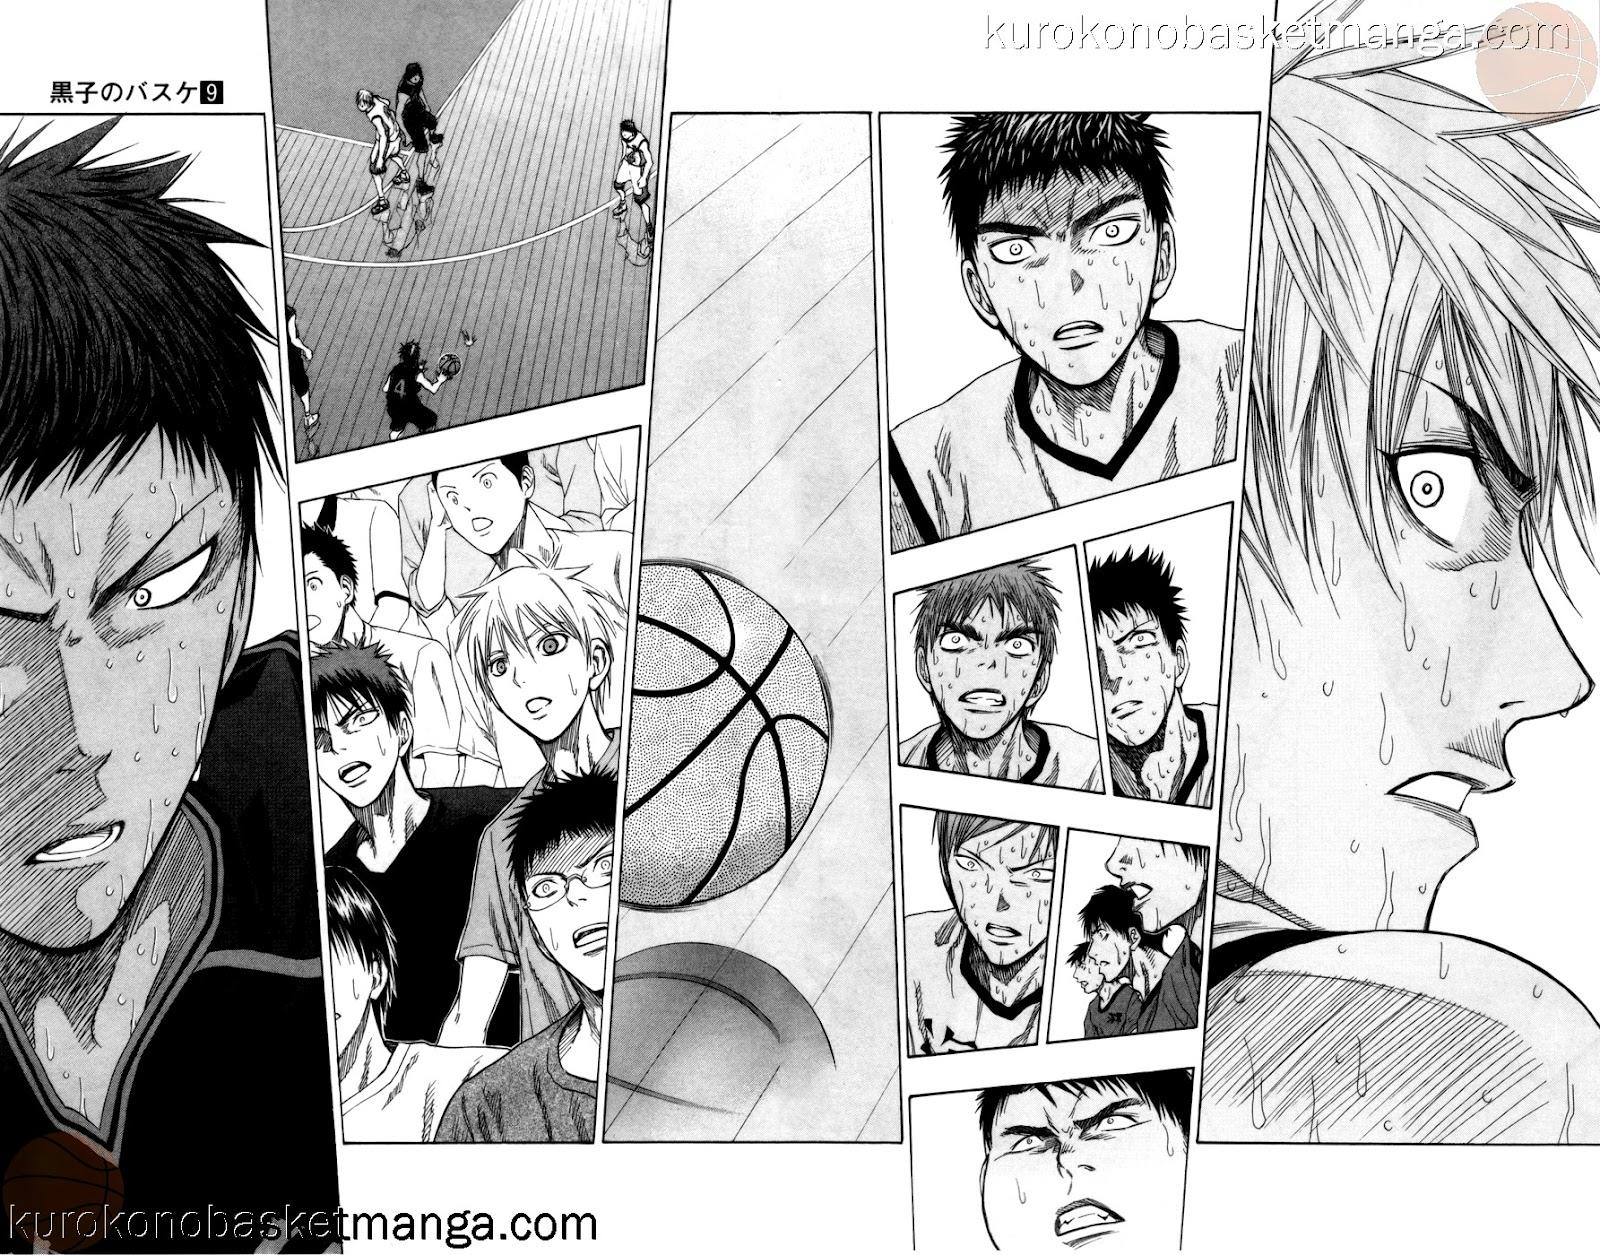 Kuroko no Basket Manga Chapter 72 - Image 10-11